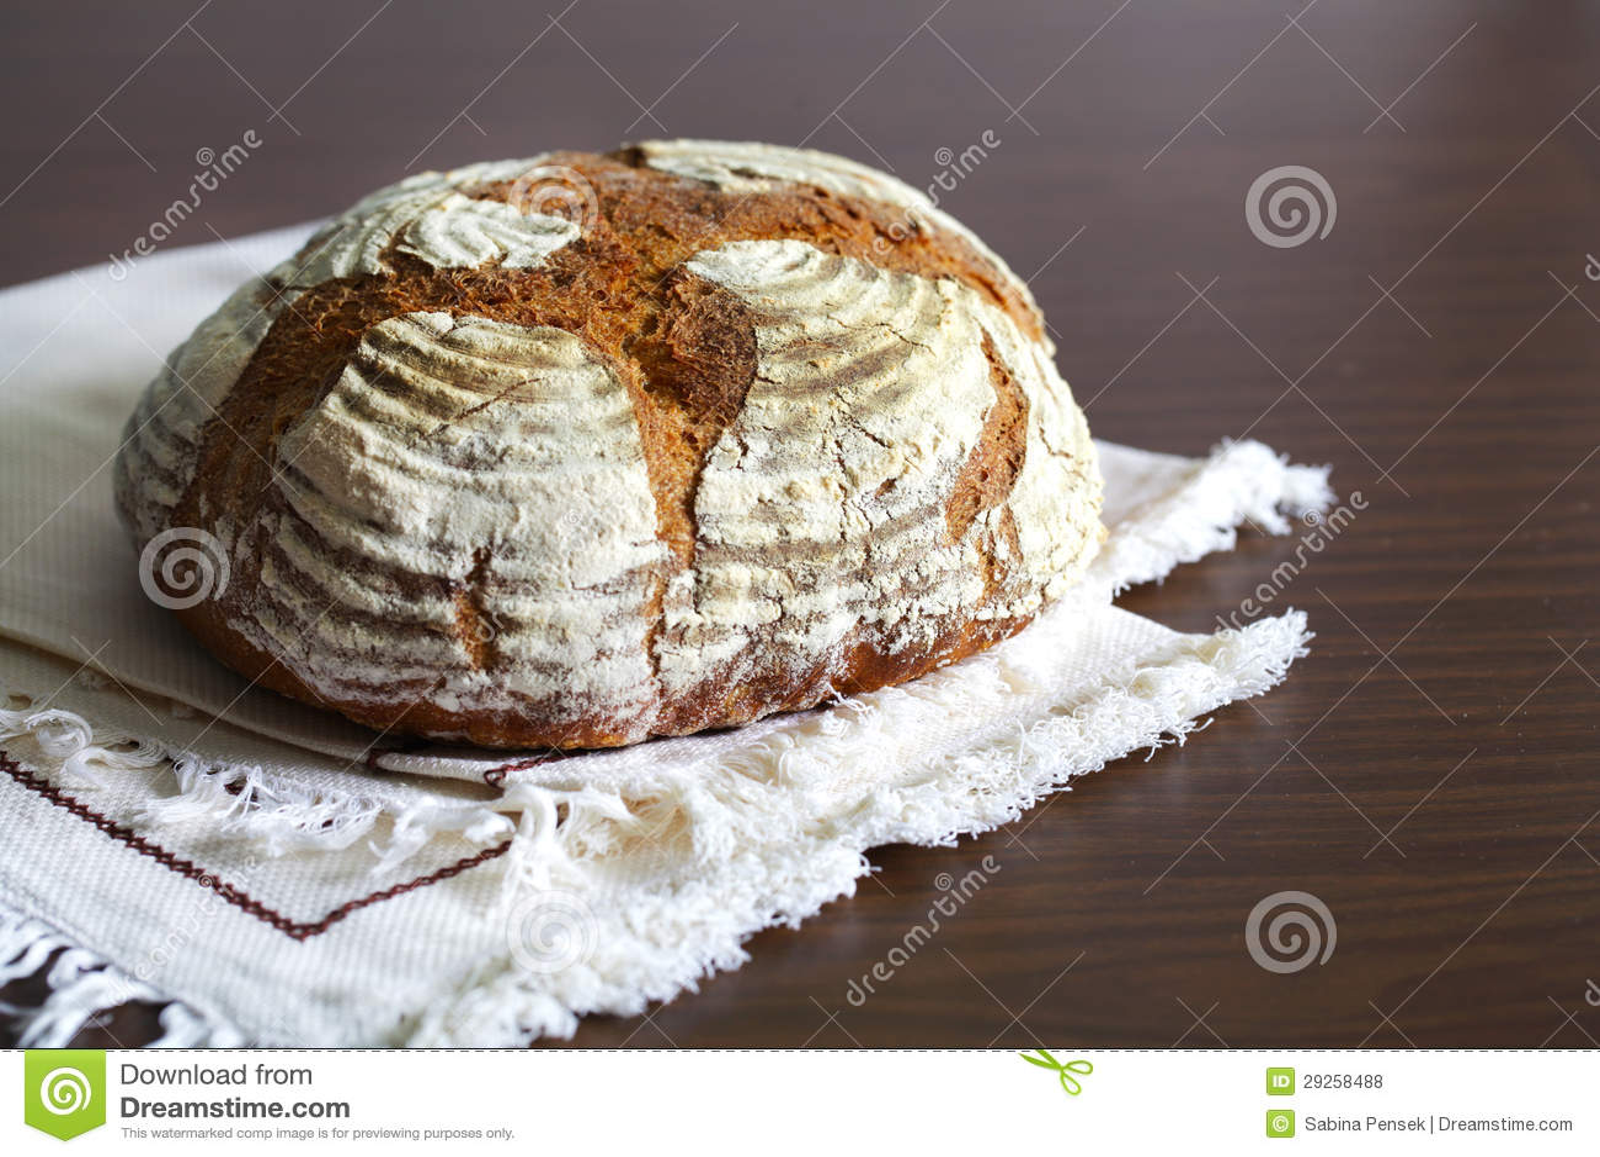 Brood van artisanaal die roggebrood, met bloem, op een lijstdoek wordt bestrooid